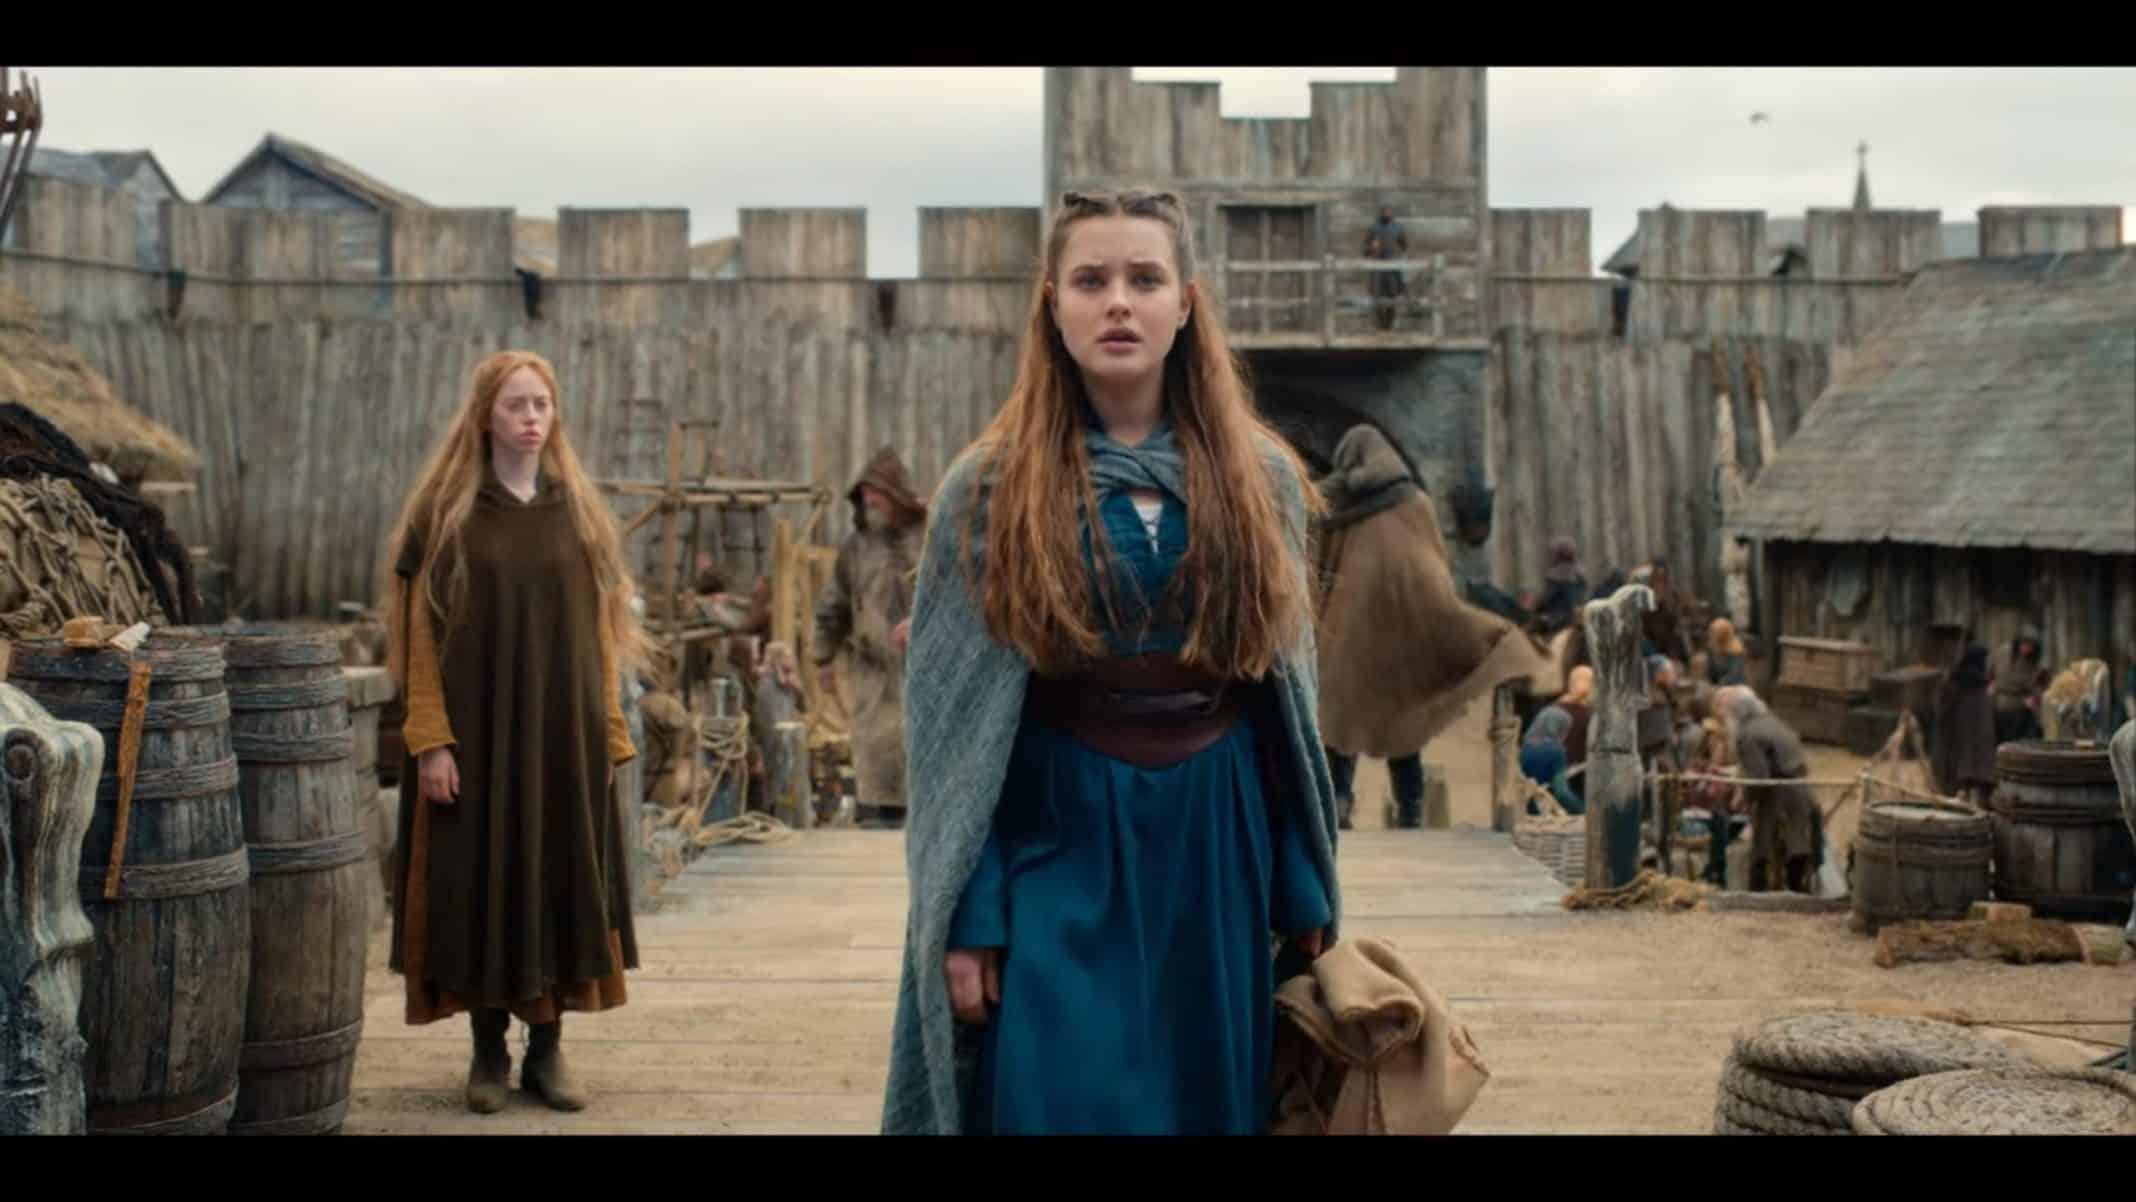 Nimue (Katherine Langford) entering a port town.